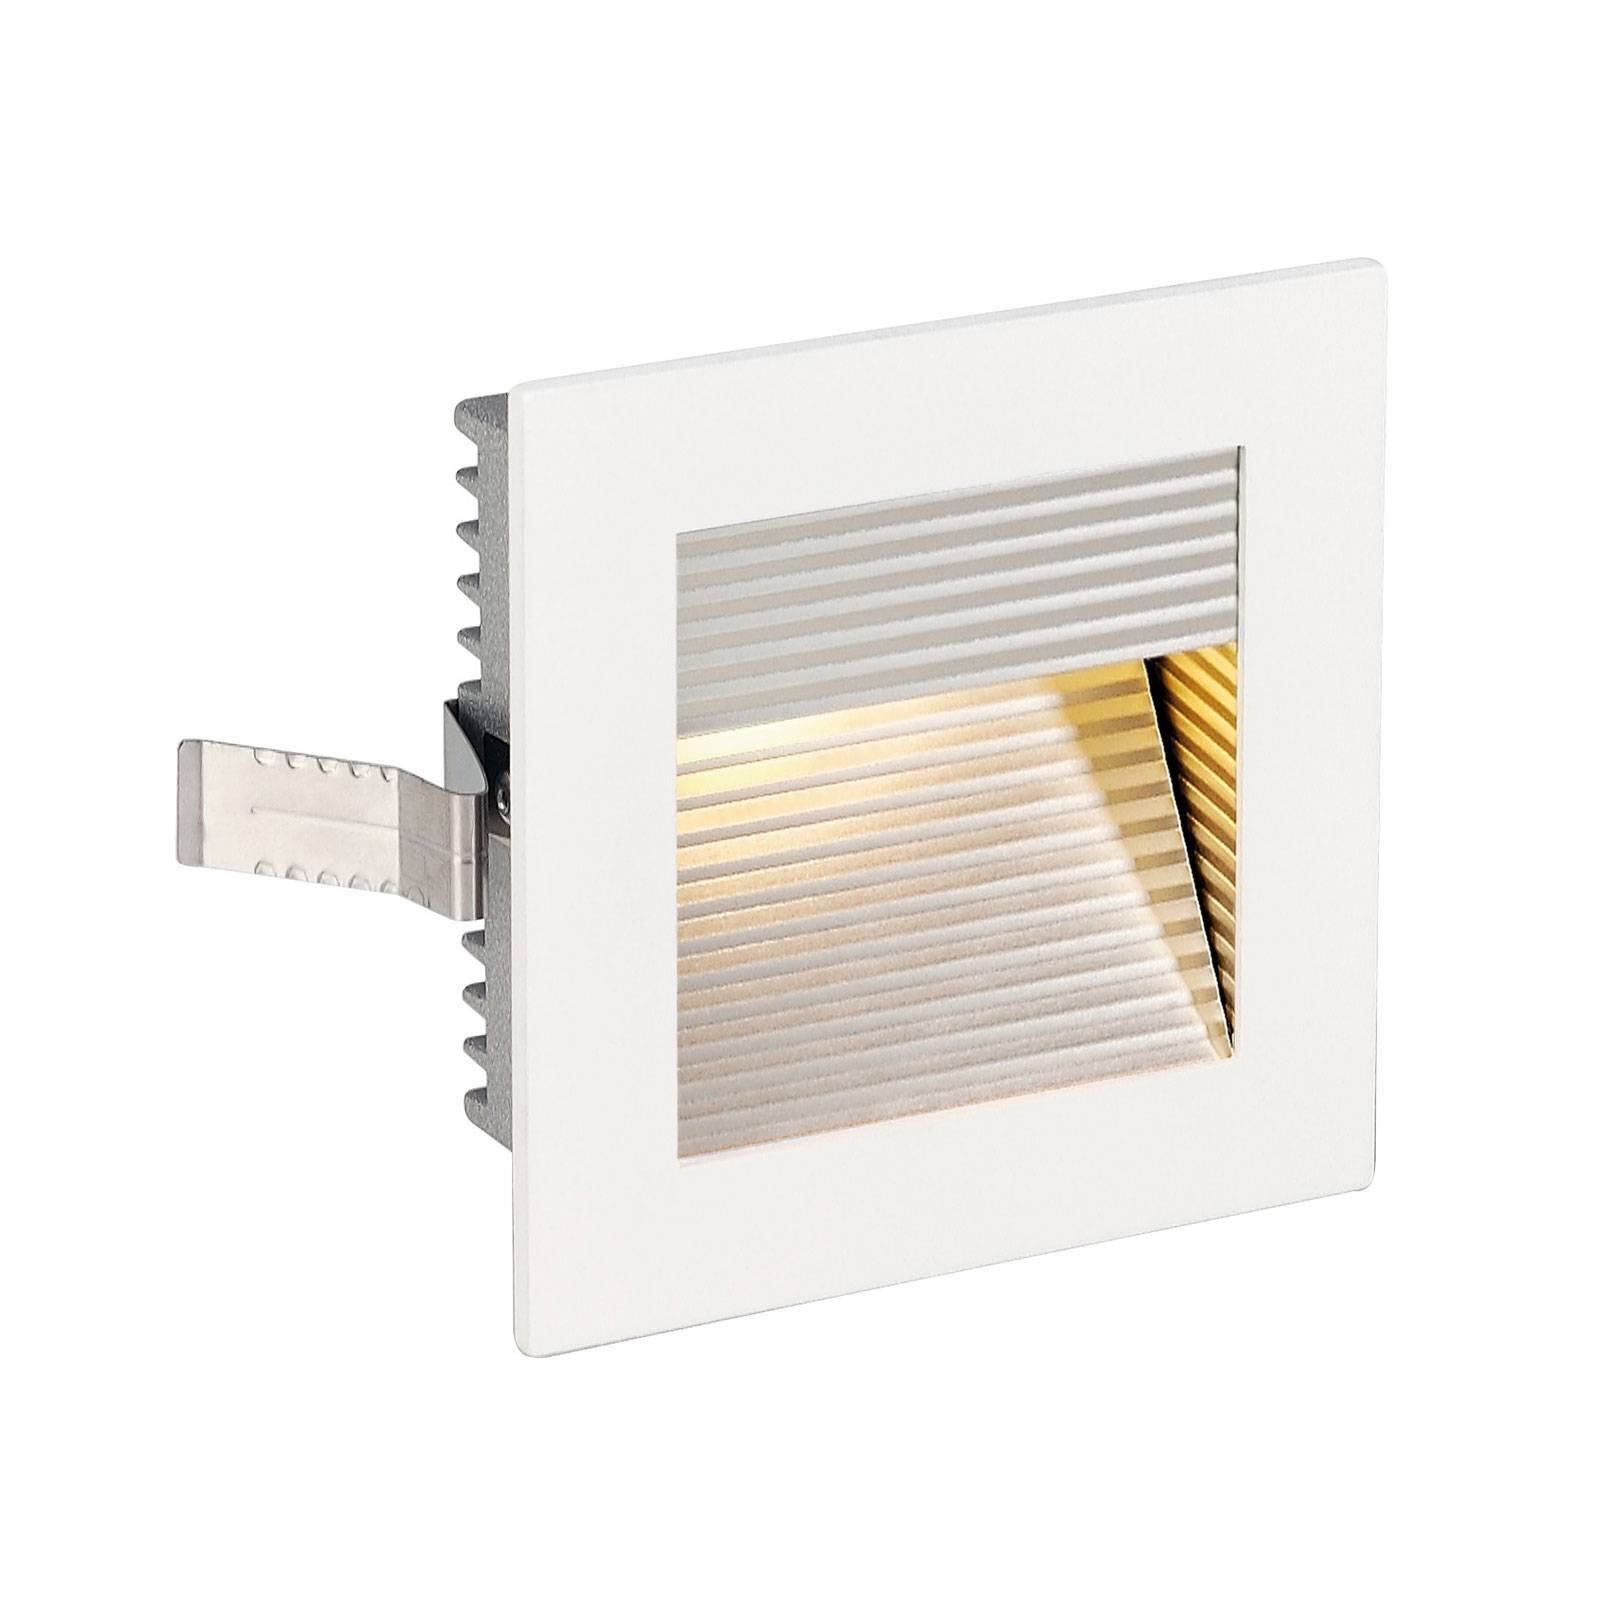 SLV LED-downlight Frame Curve LED 3 000 K, hvit